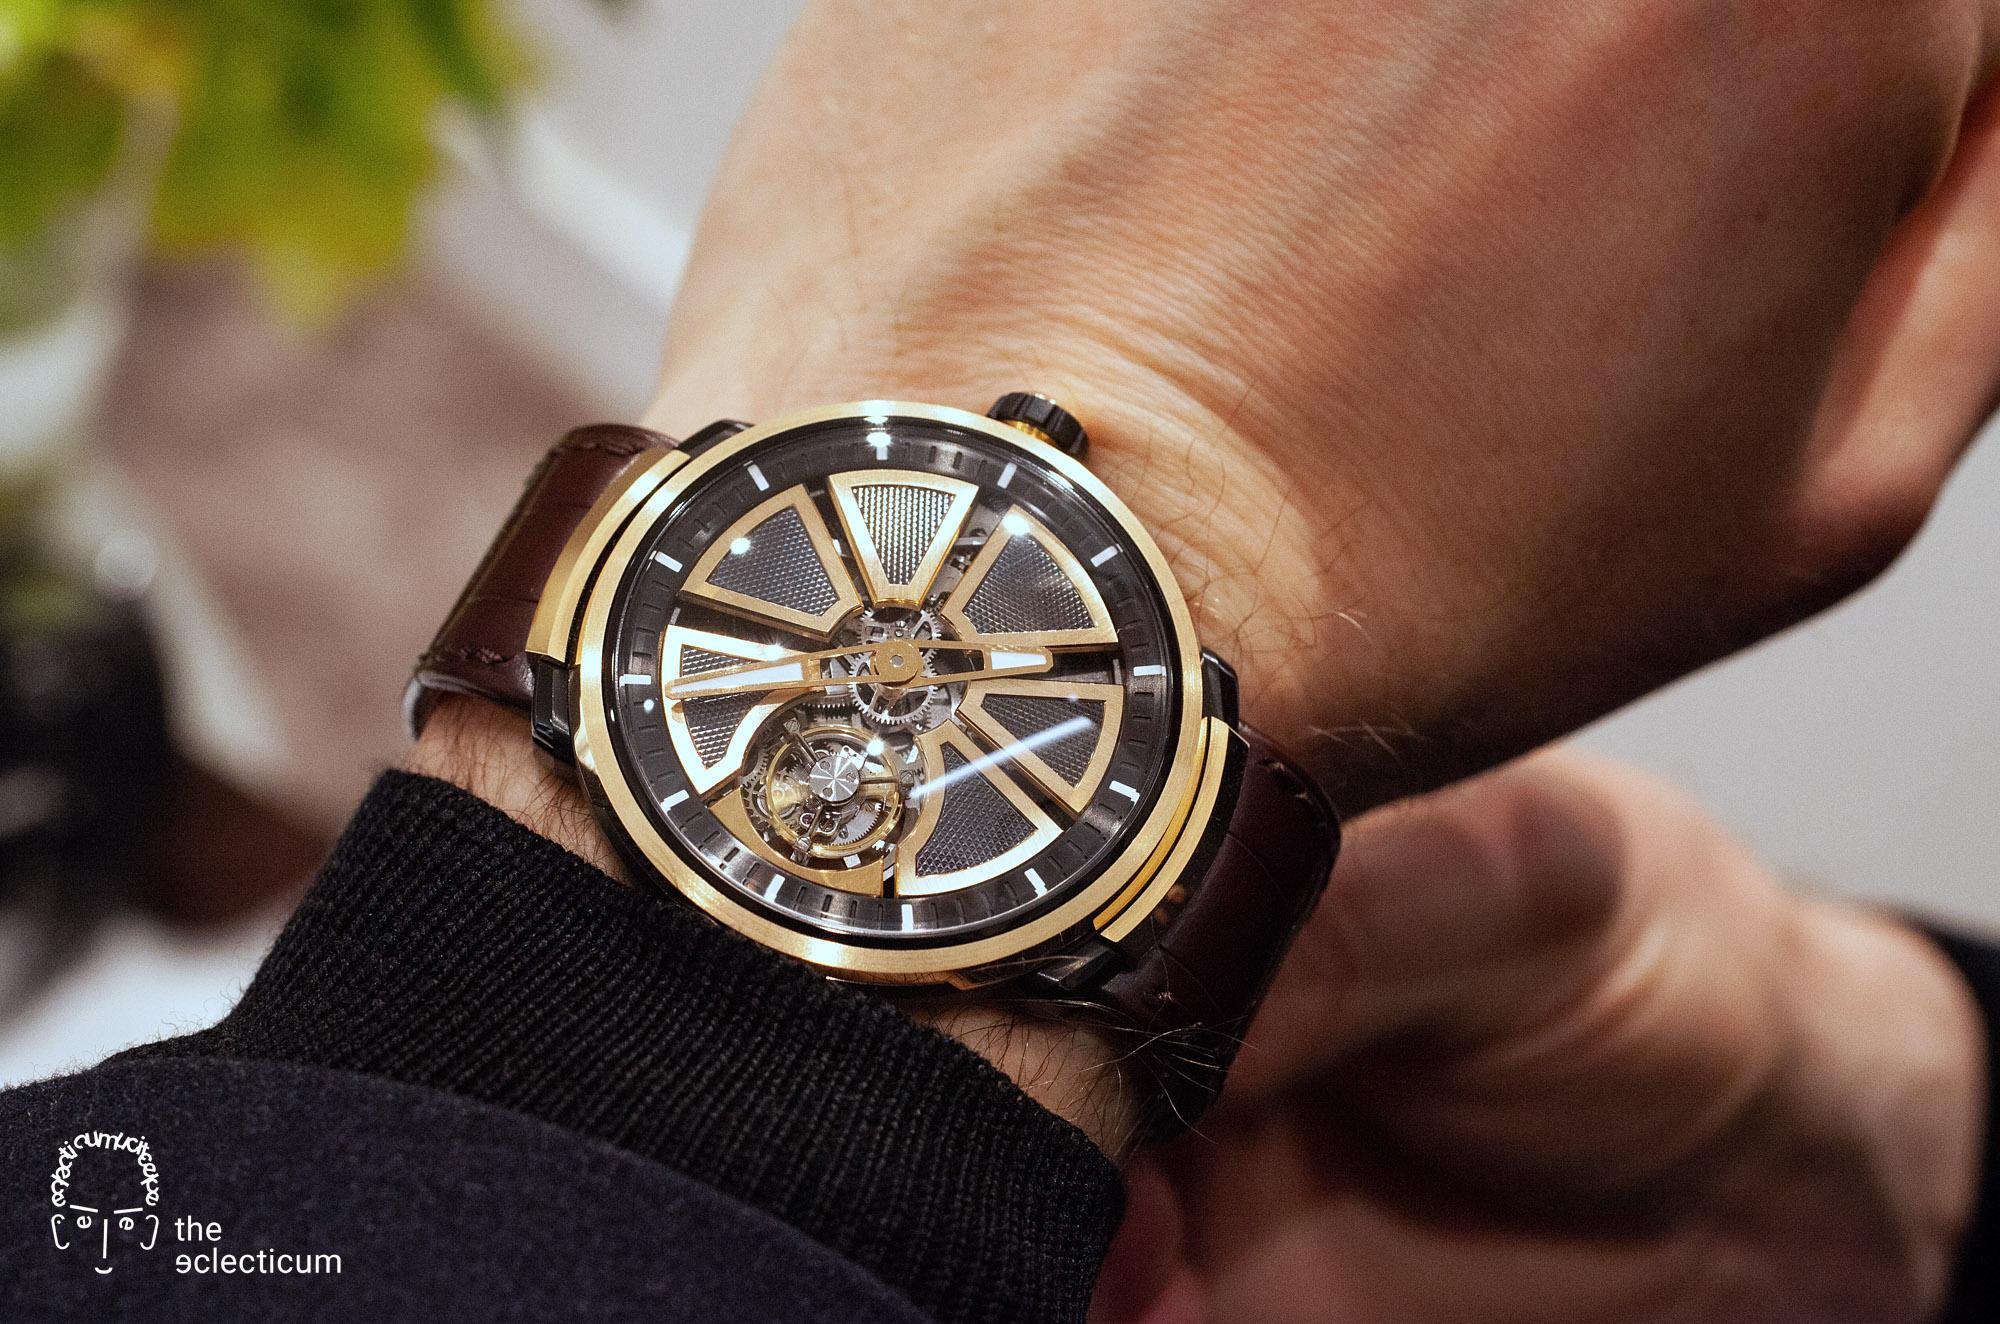 Faberge Visionnaire Tourbillon flying Renaud Papi guillochage wristshot